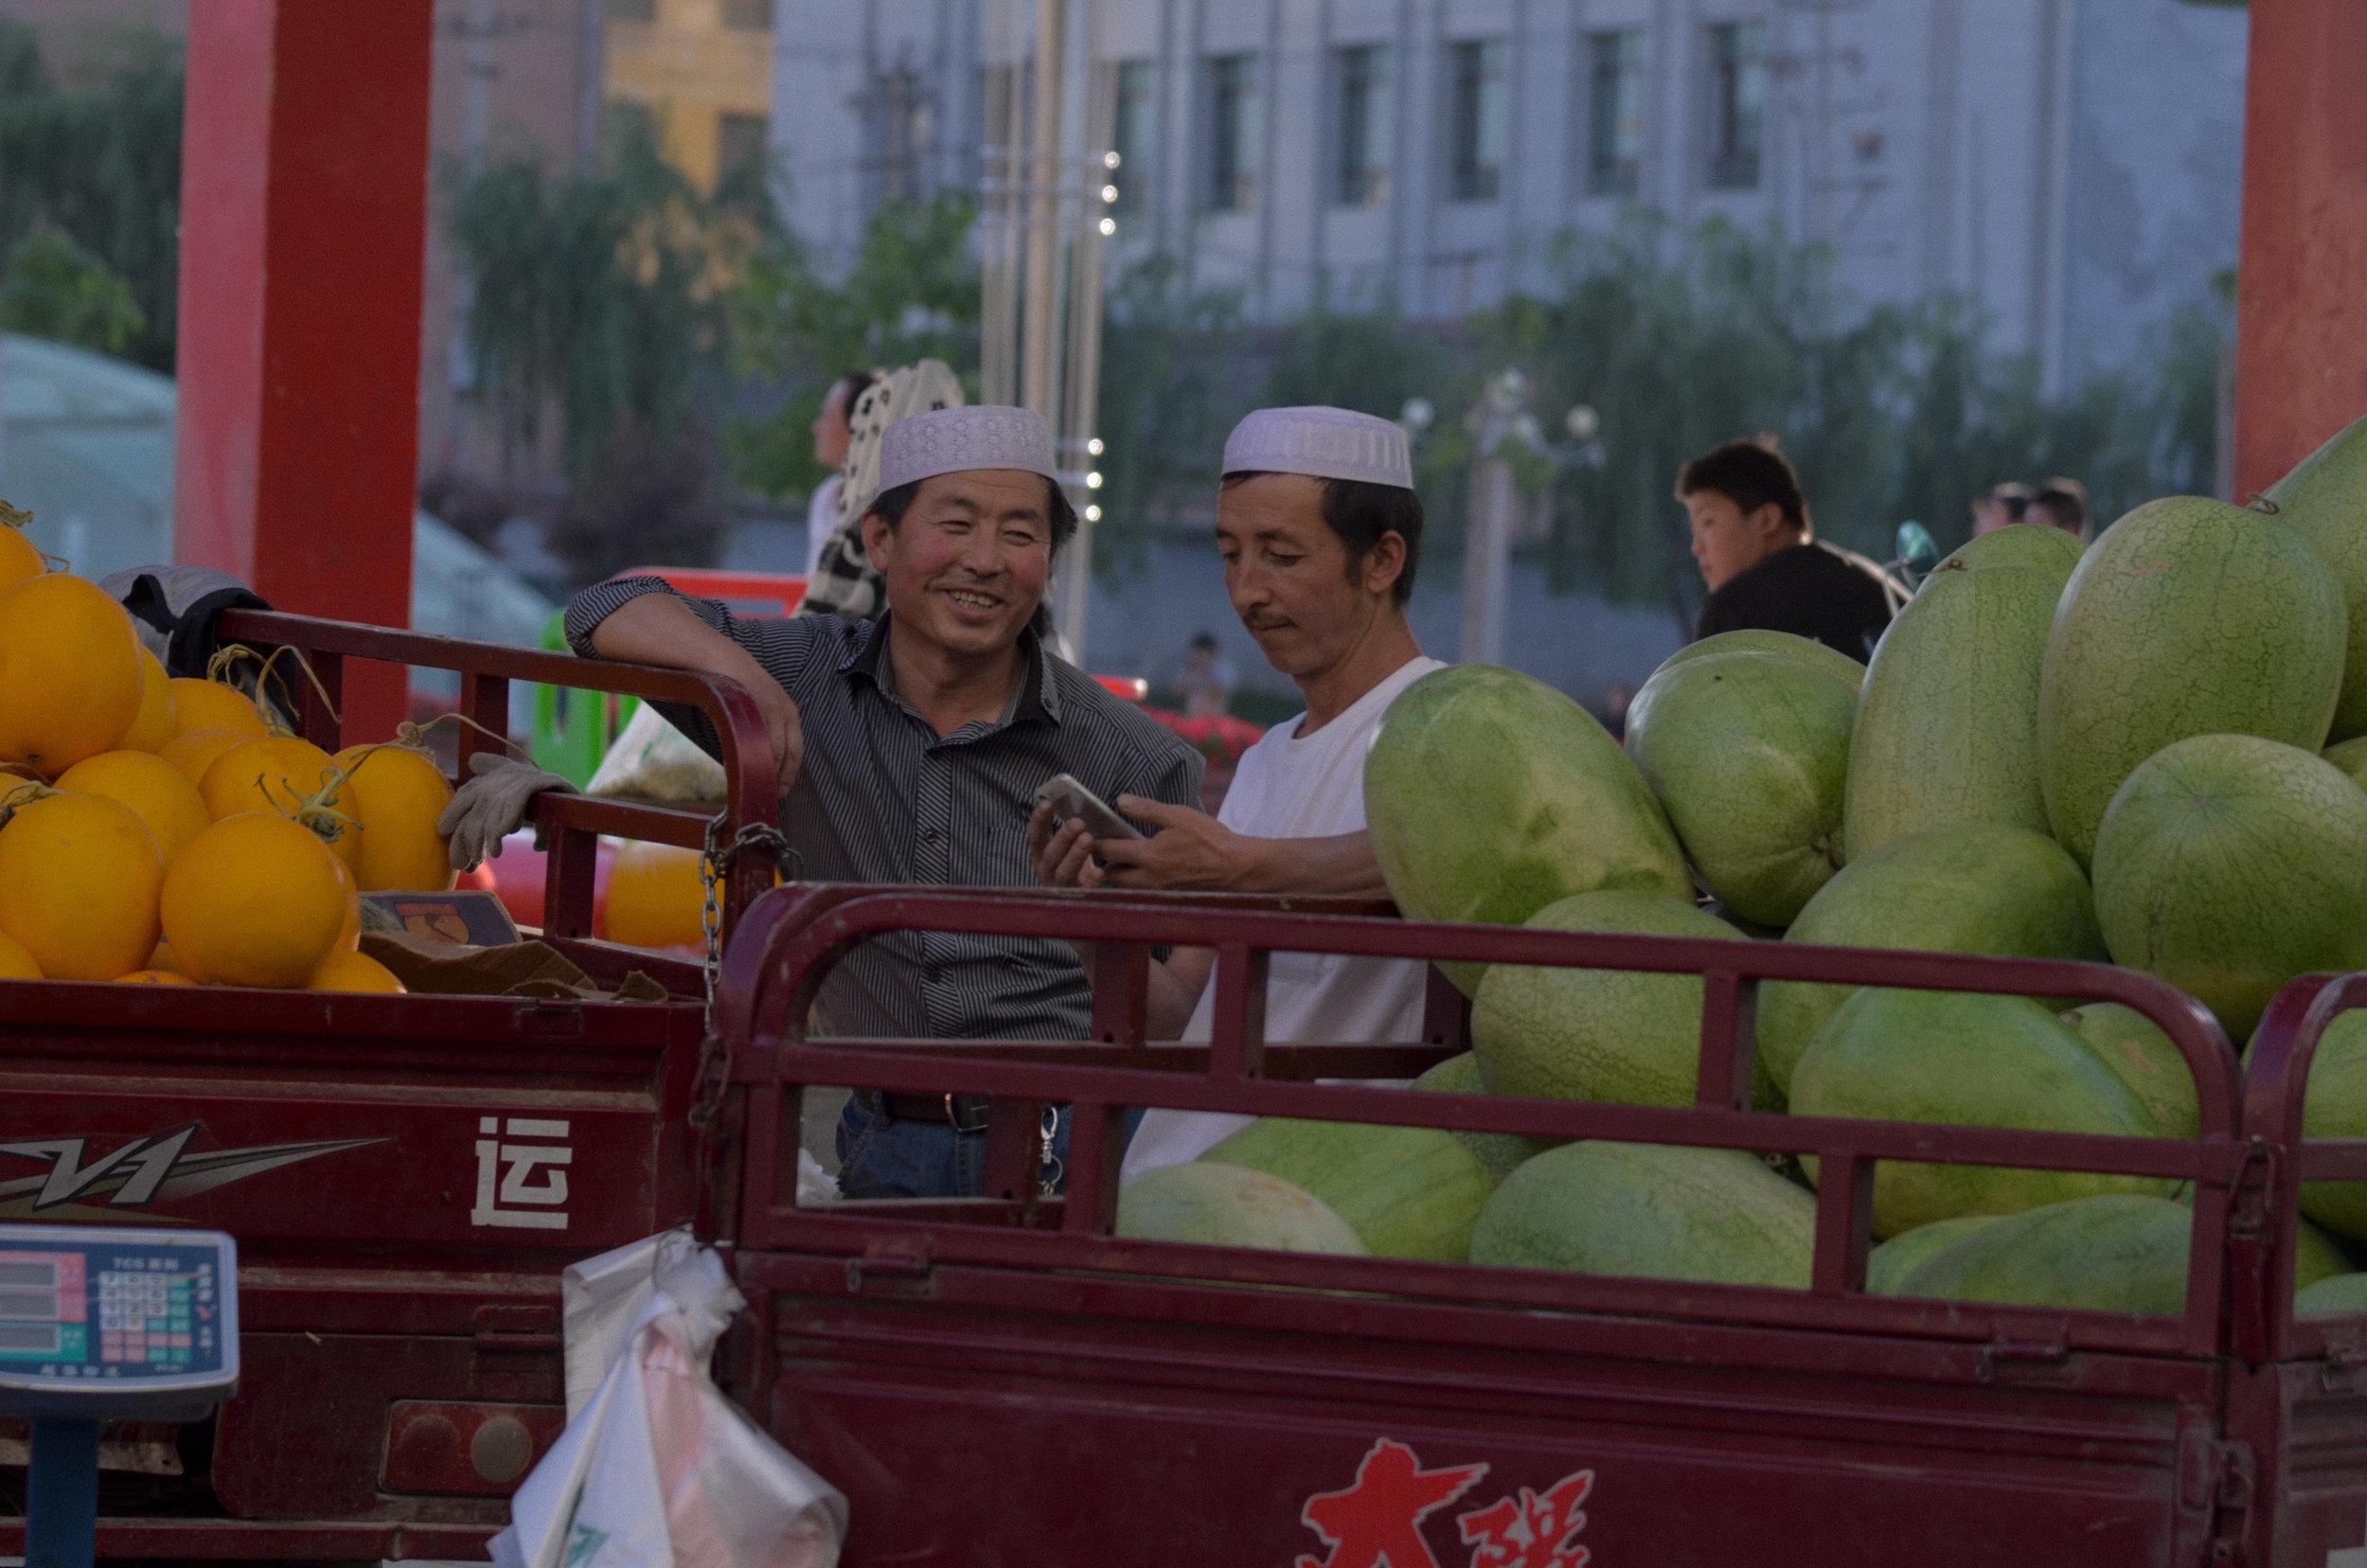 ( Photography ) Melon Brothers, China, 2016.